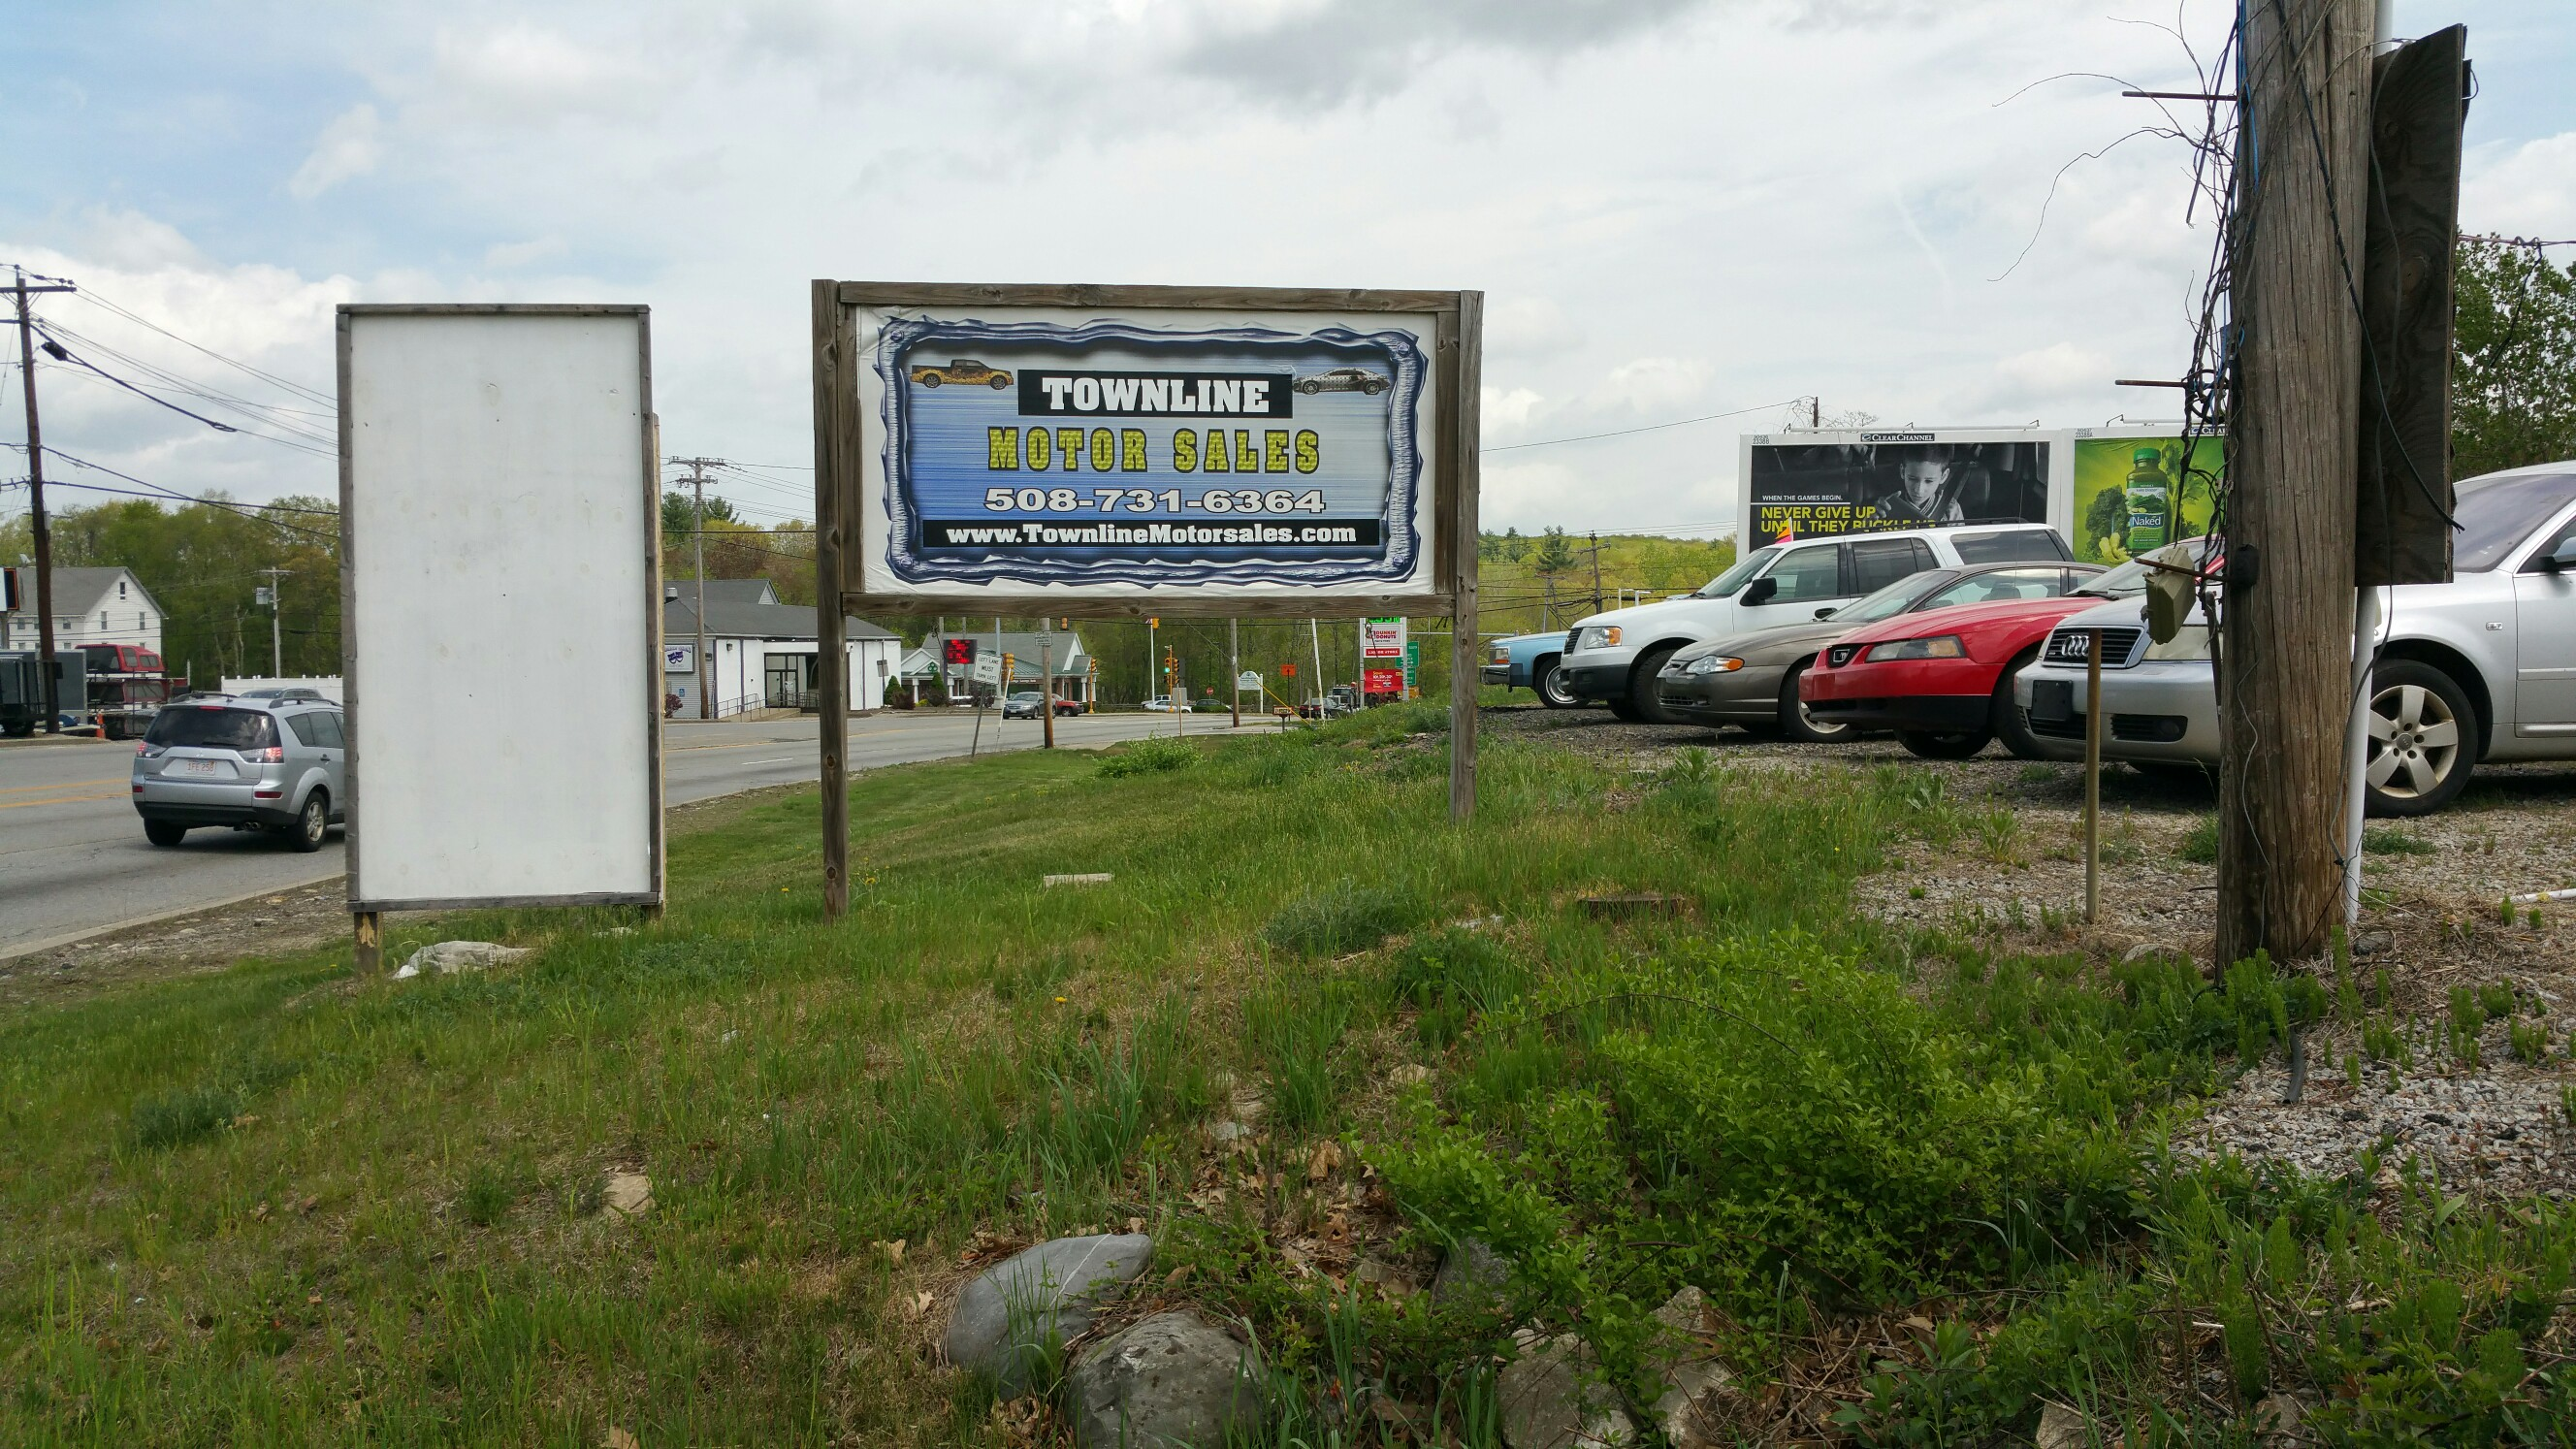 Townline Motor Sales, North Oxford MA